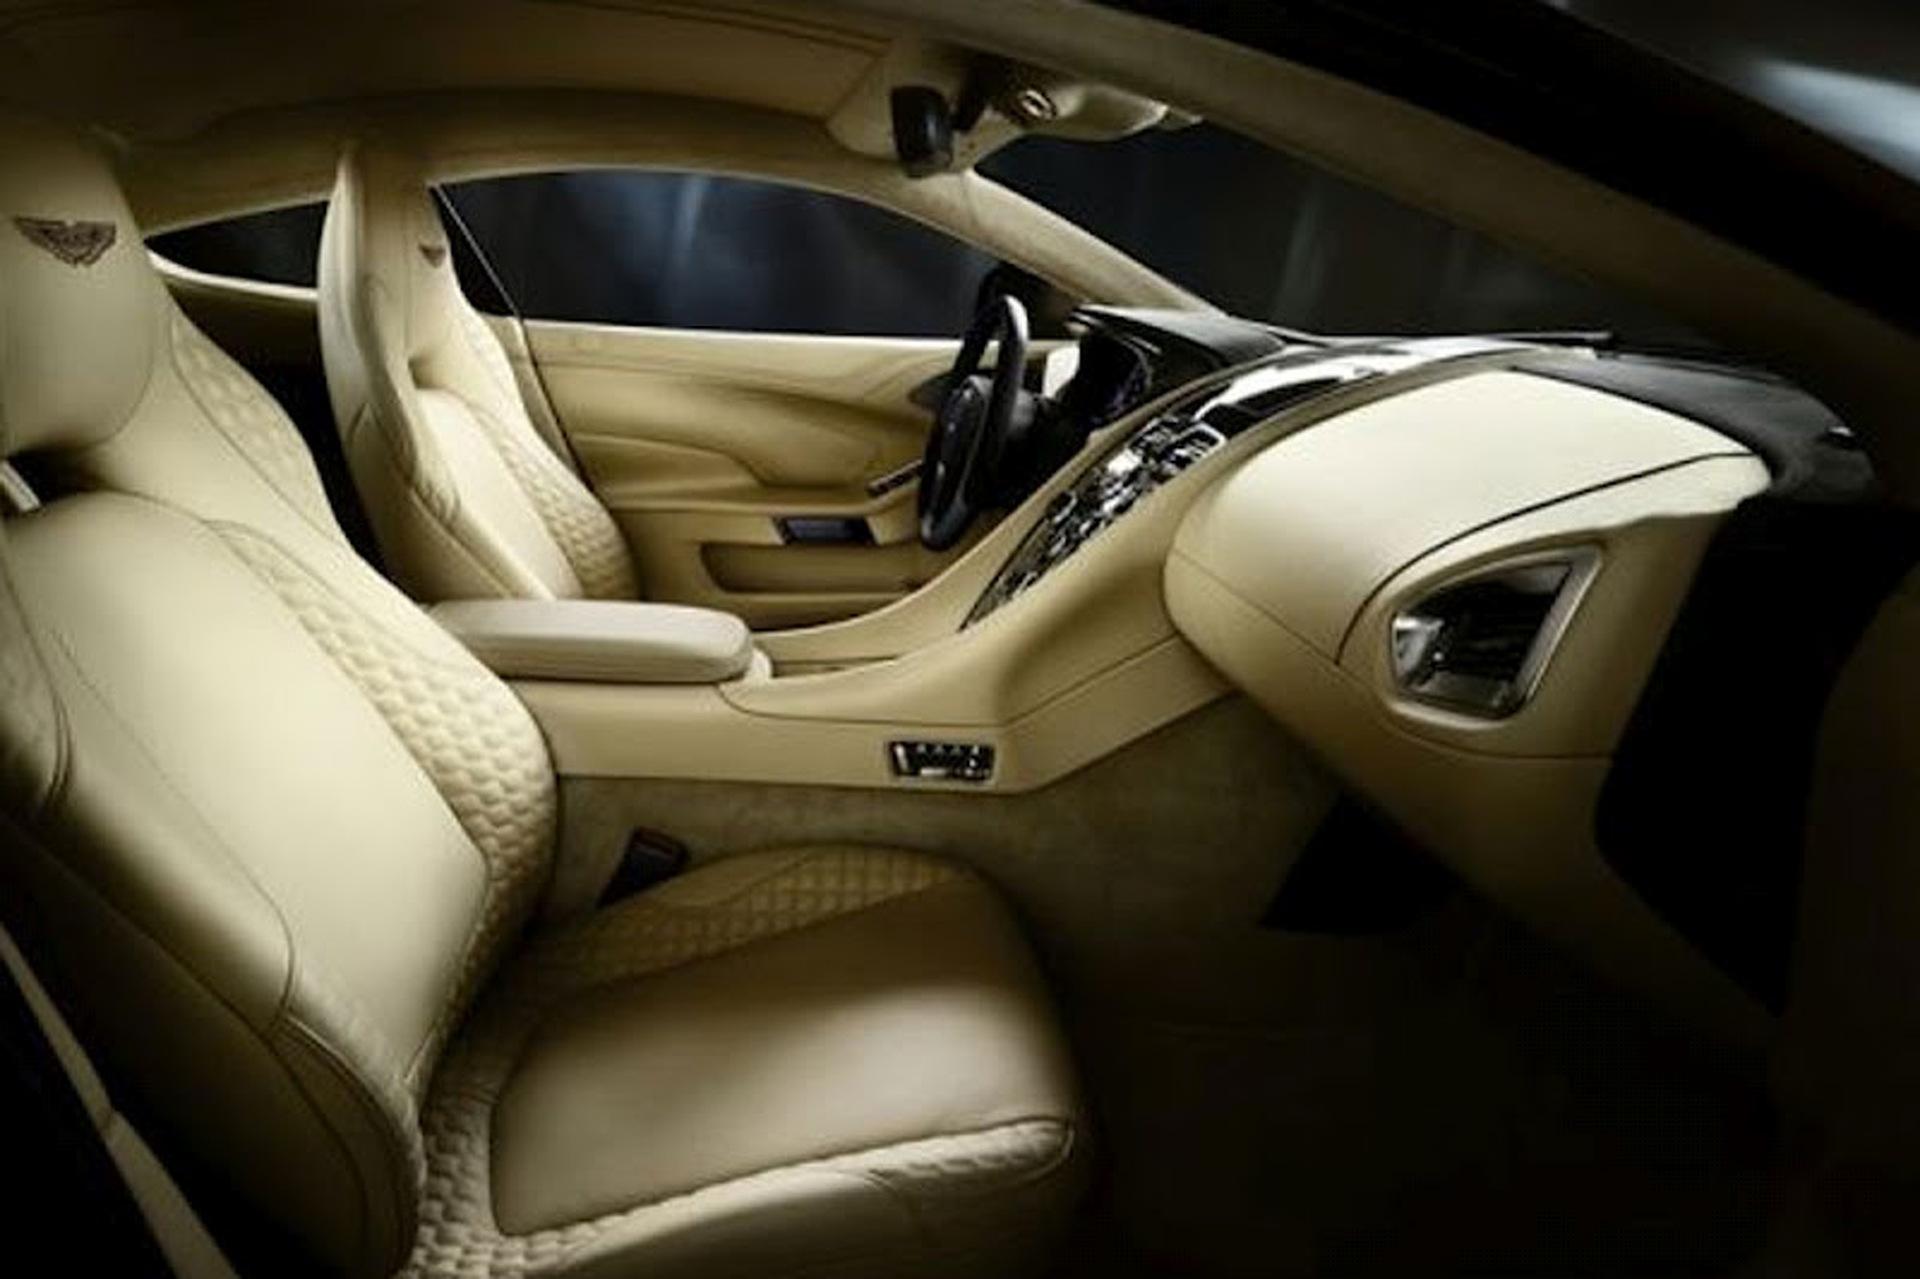 Aston Martin Vanquish Leaked Online